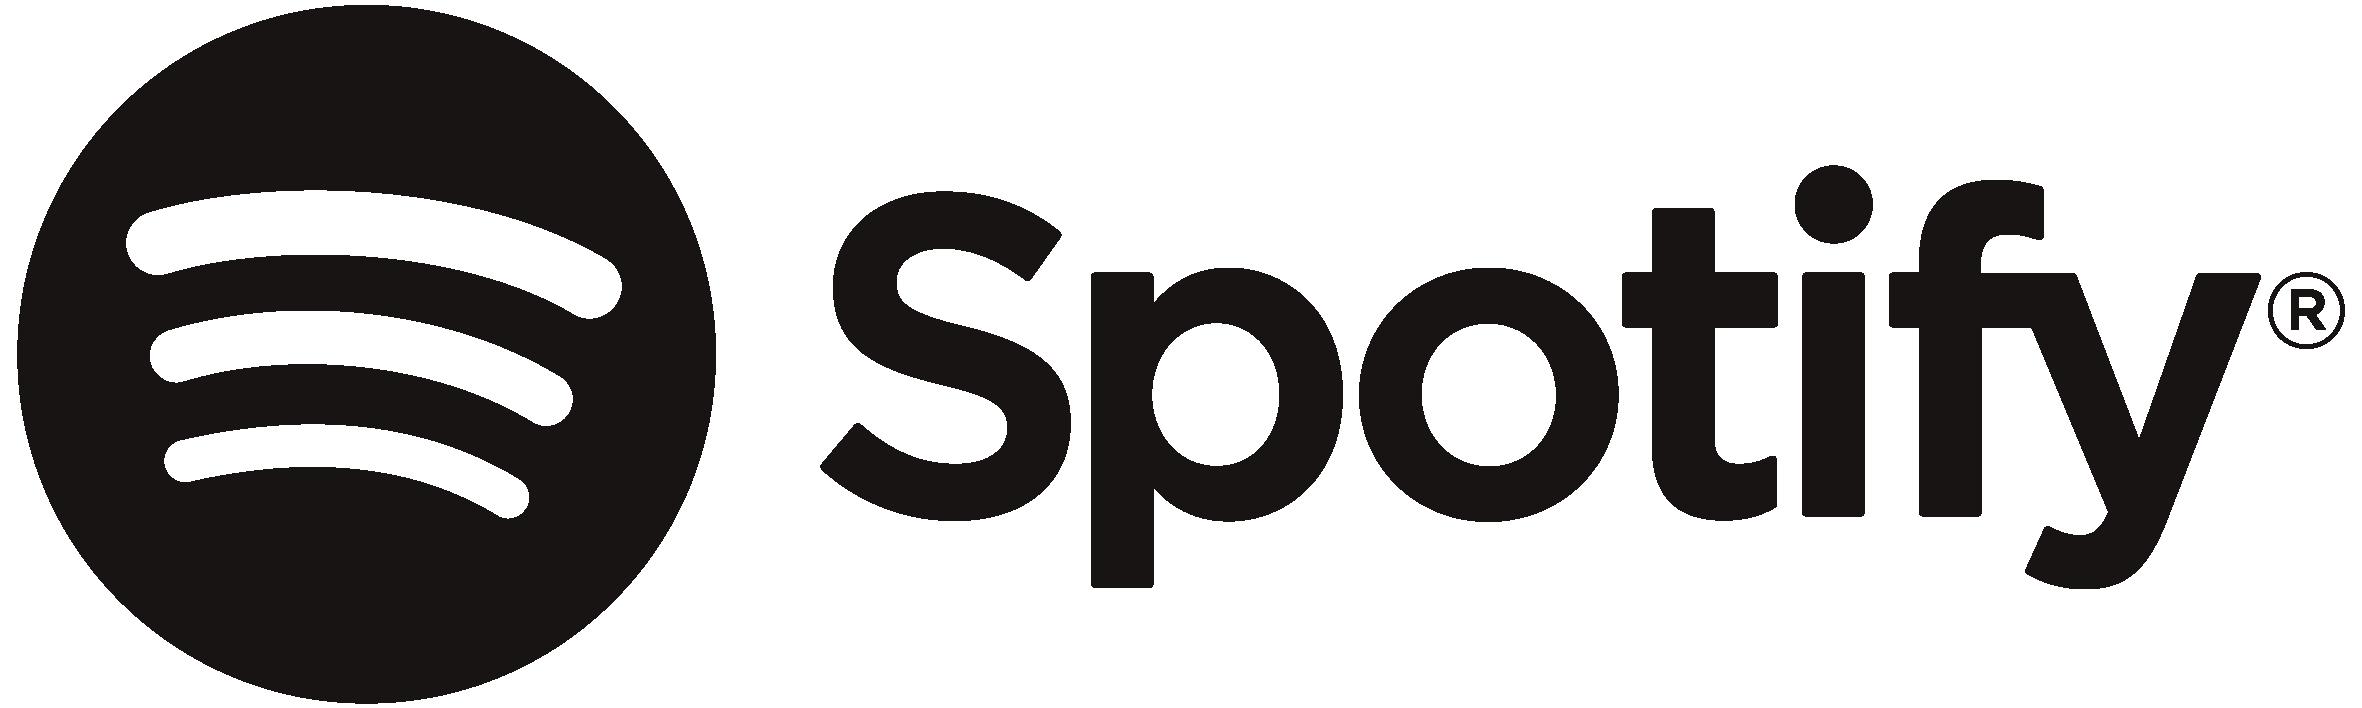 las mejores apps para escuchar musica streaming spotify